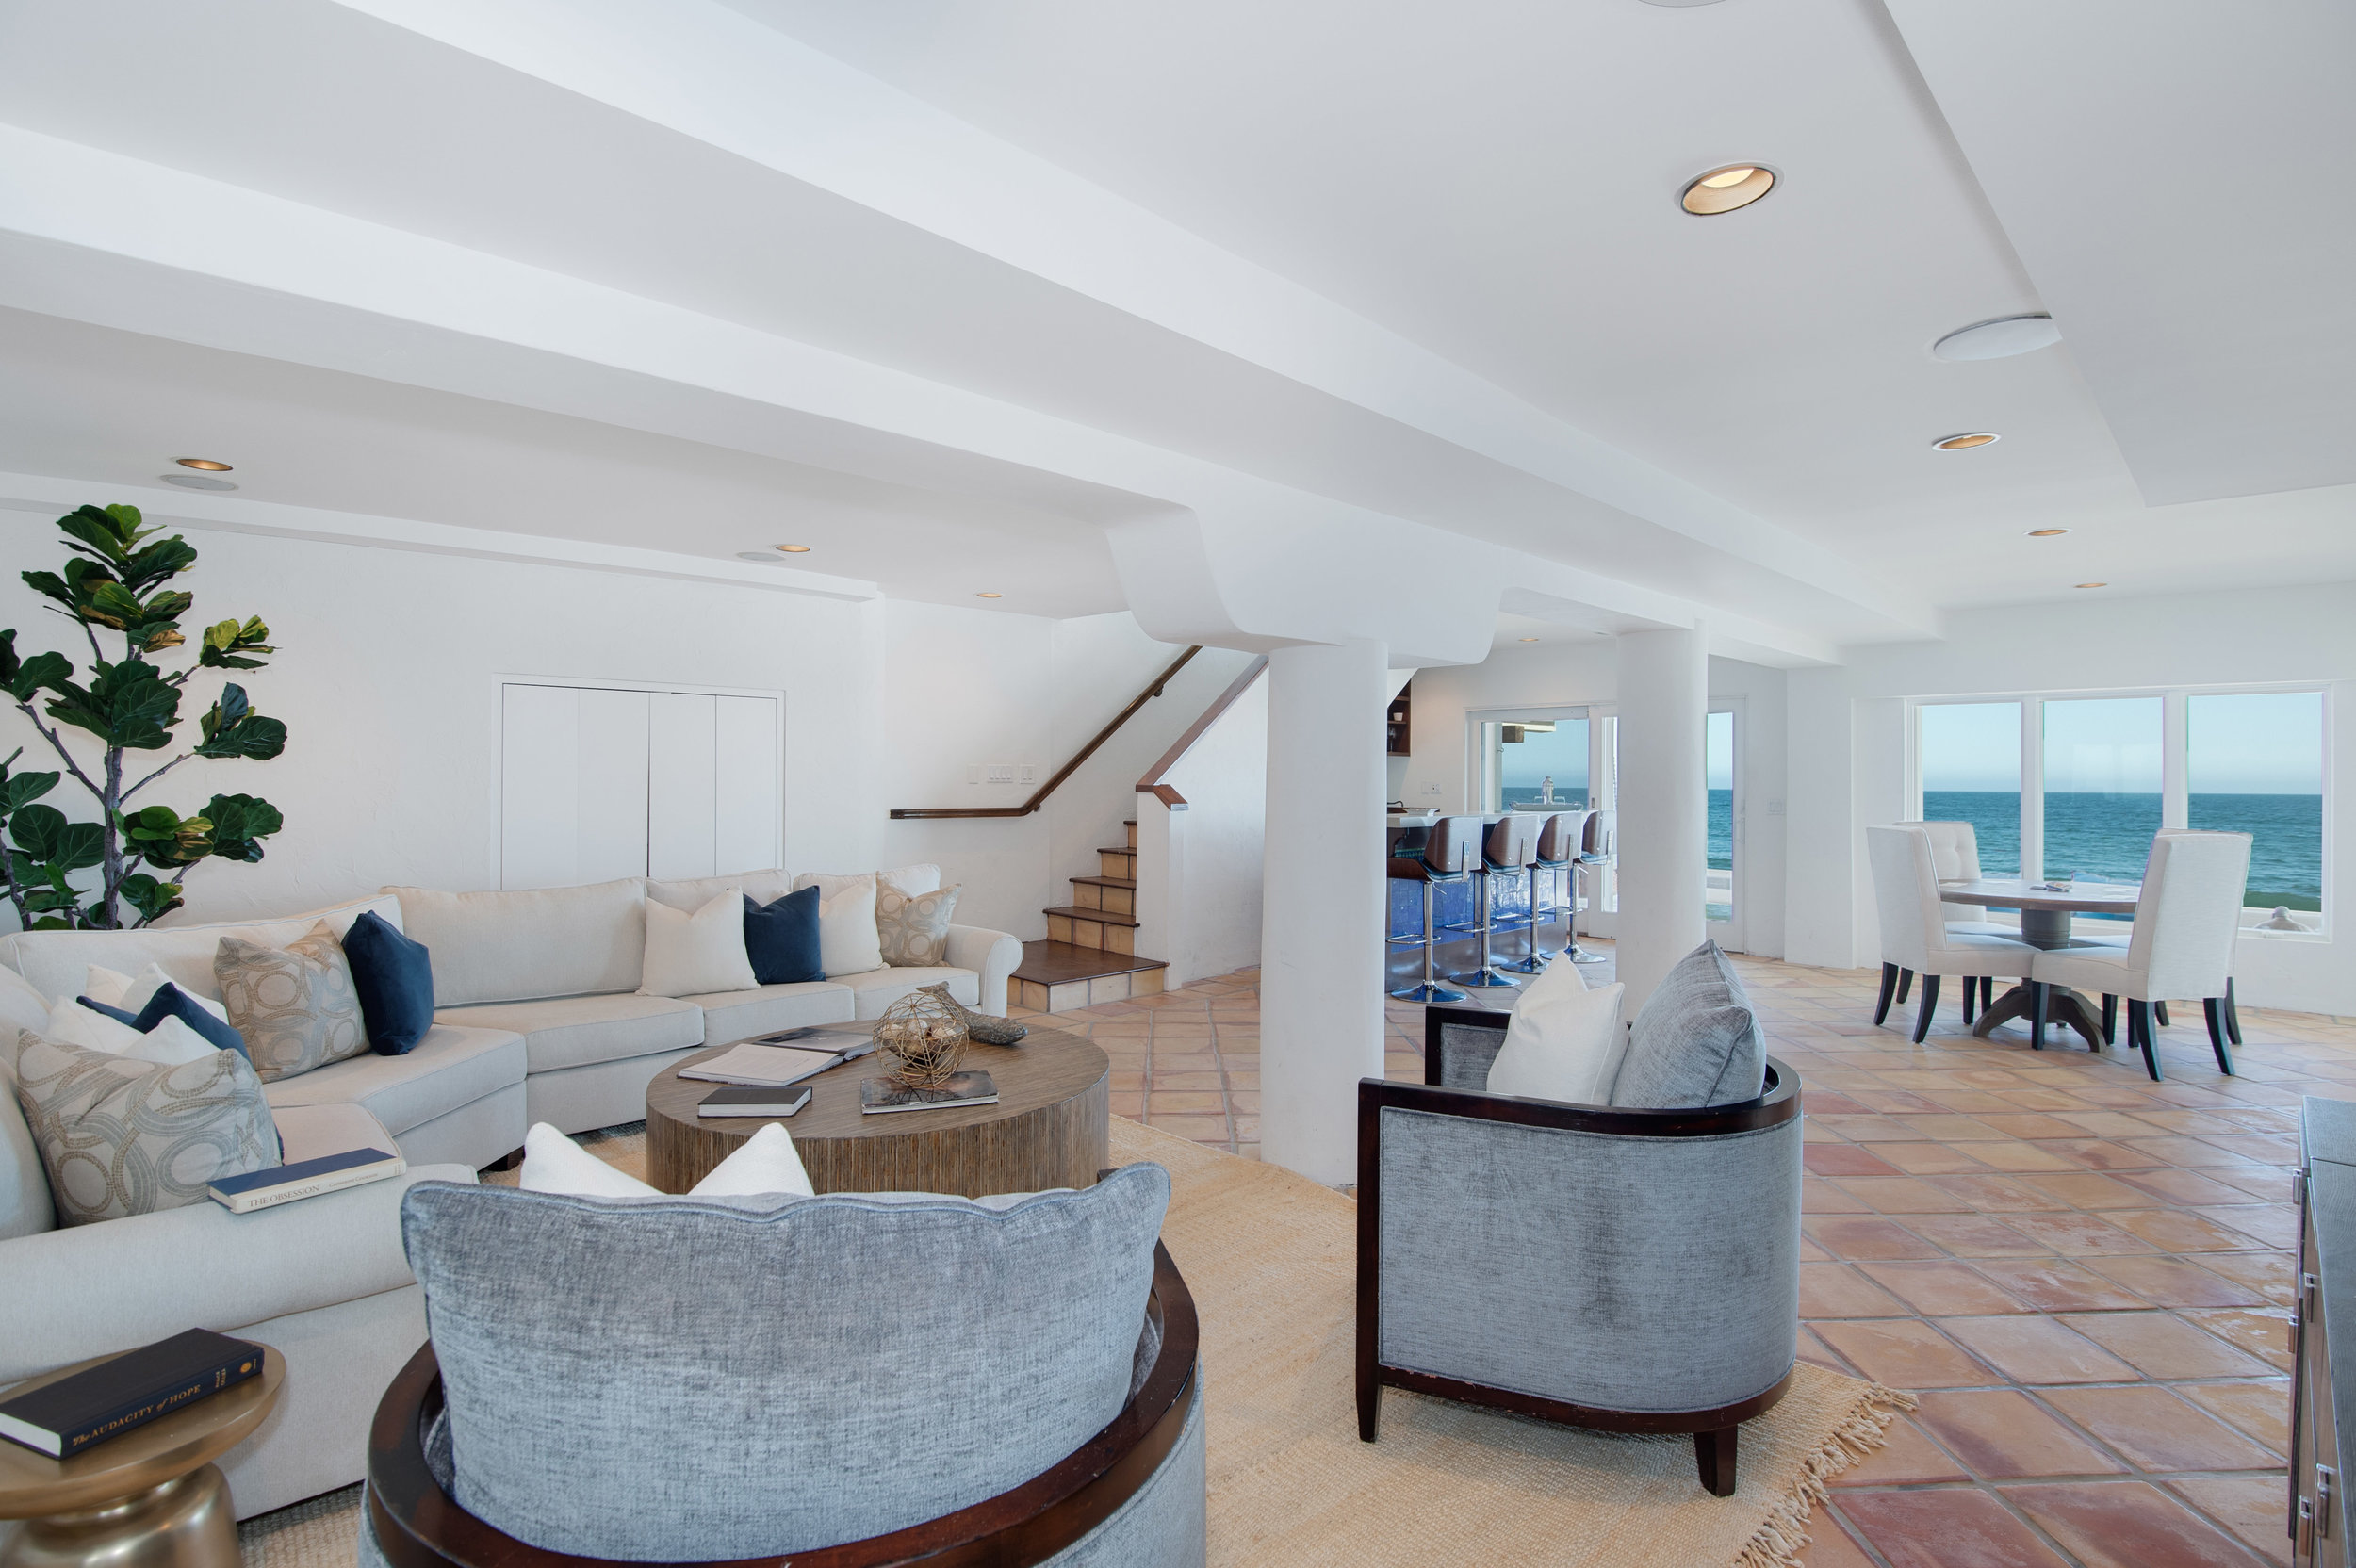 023 Den 25342 Malibu Road For Sale Lease The Malibu Life Team Luxury Real Estate.jpg